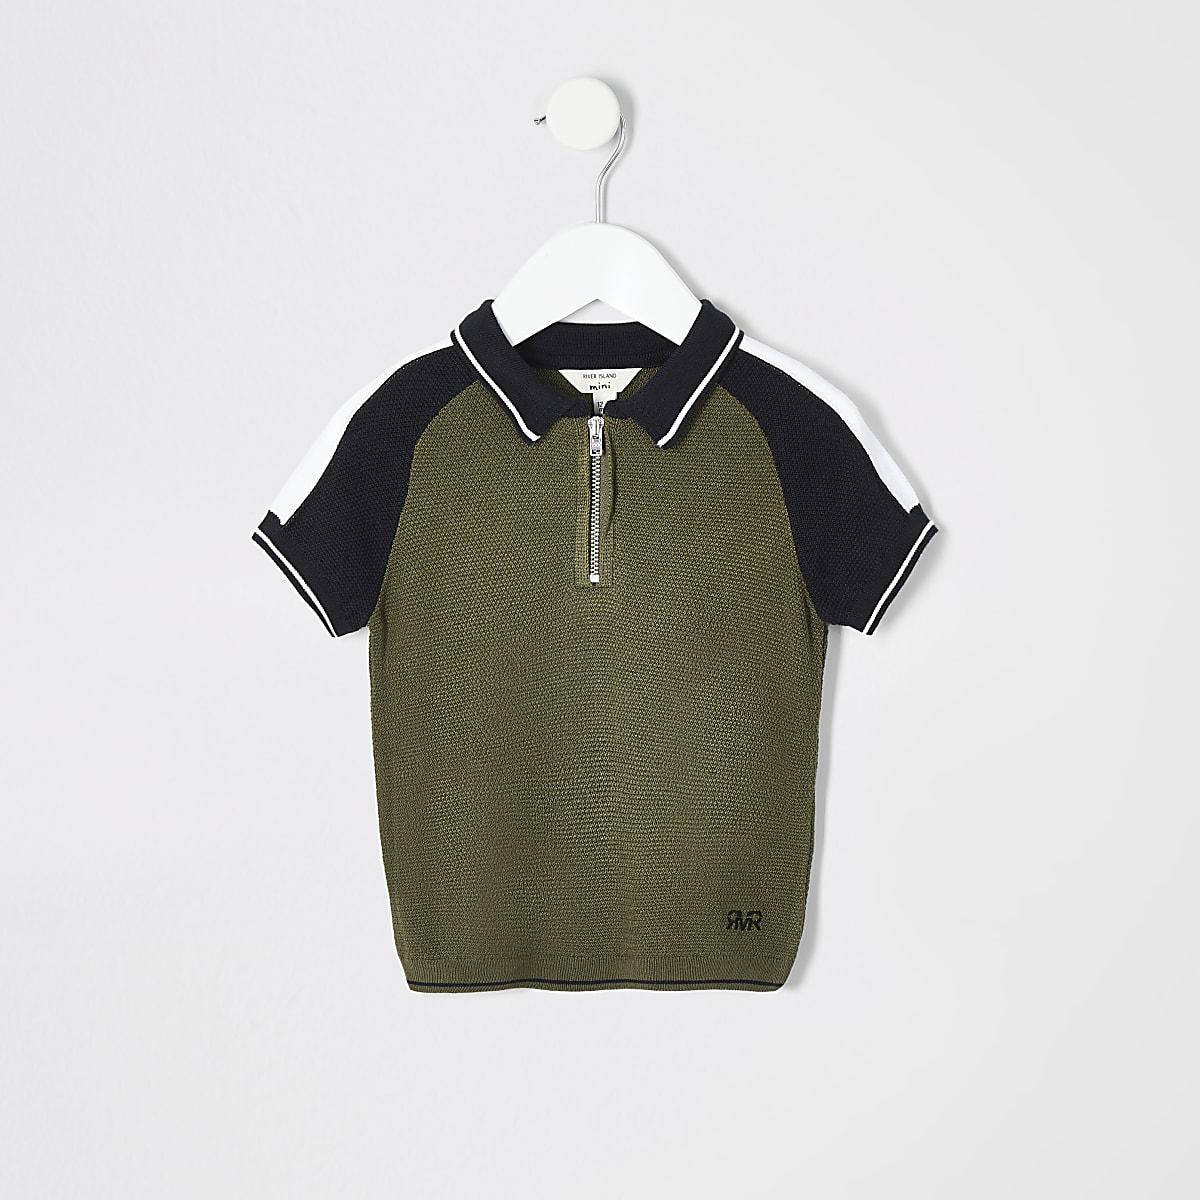 Polohemd in Khaki mit Reißverschluss